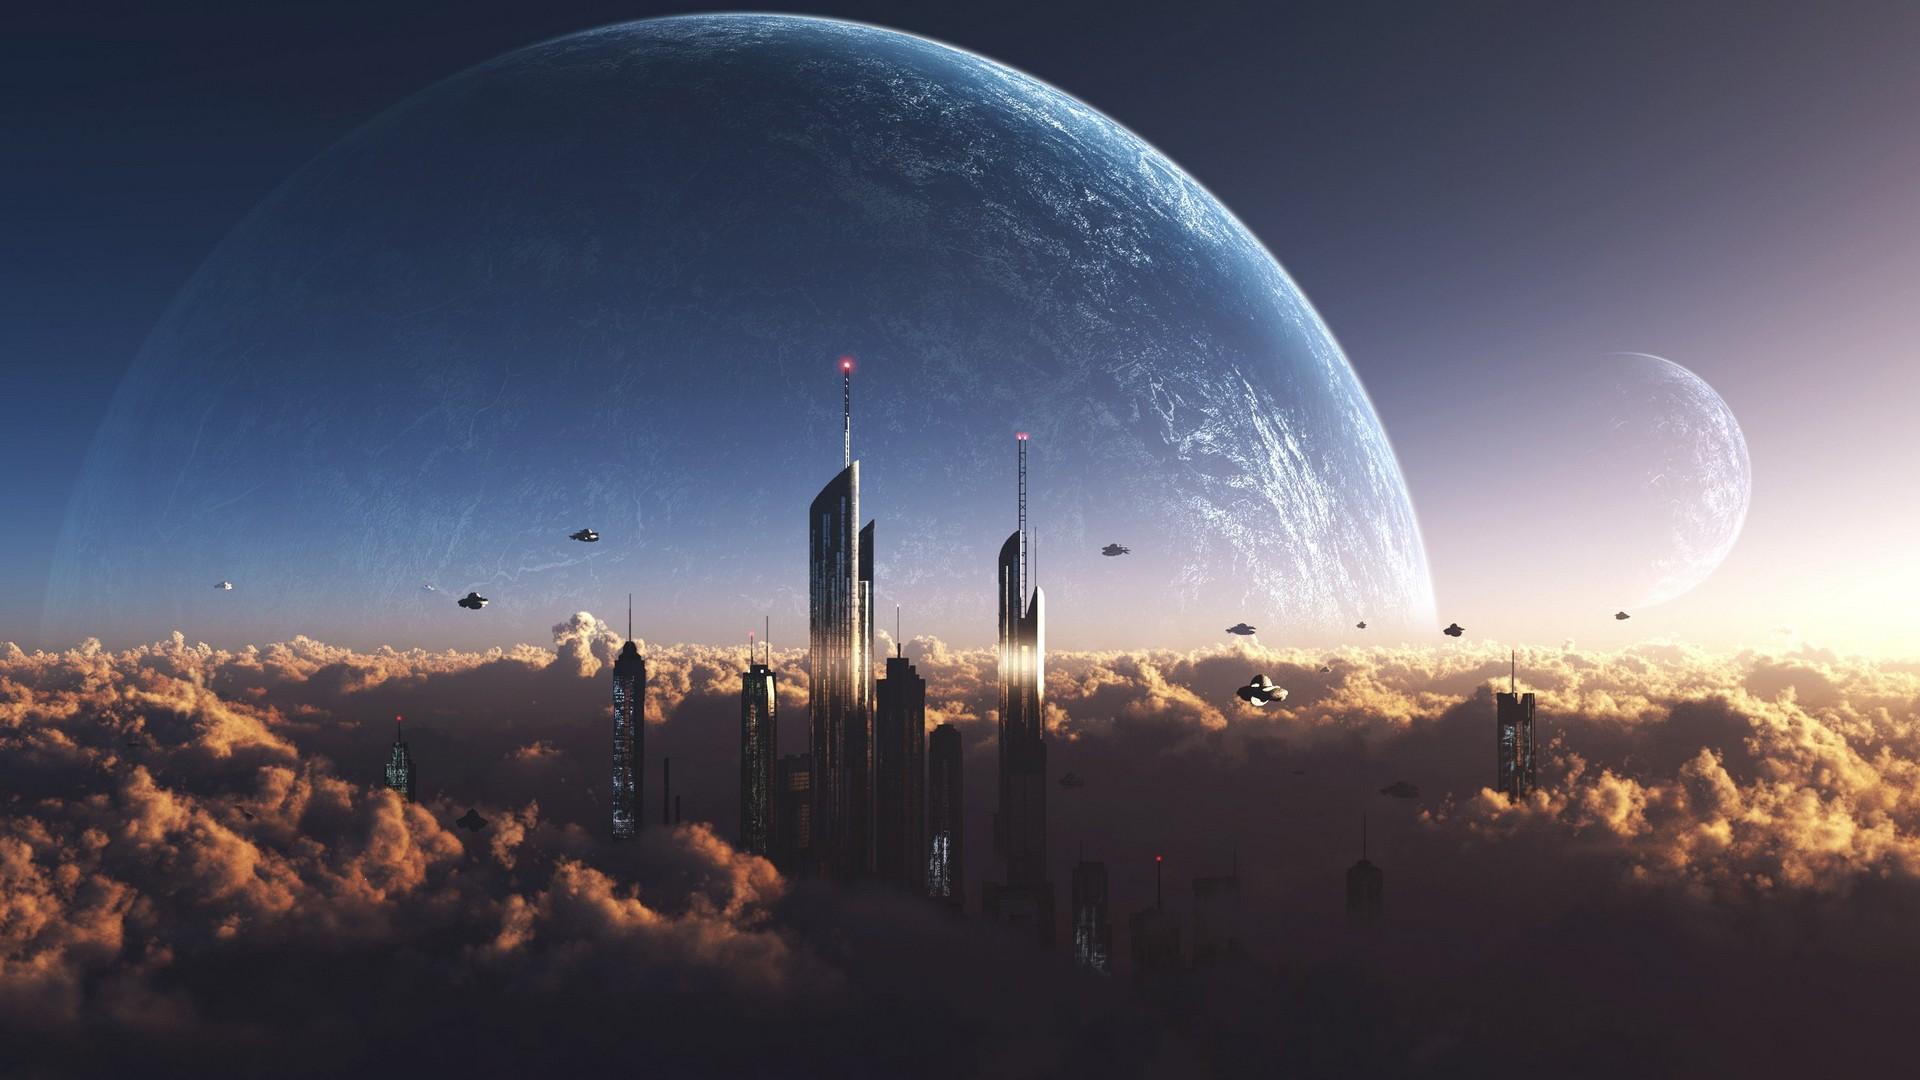 Wallpaper Sunlight City Planet Space Sky Moon